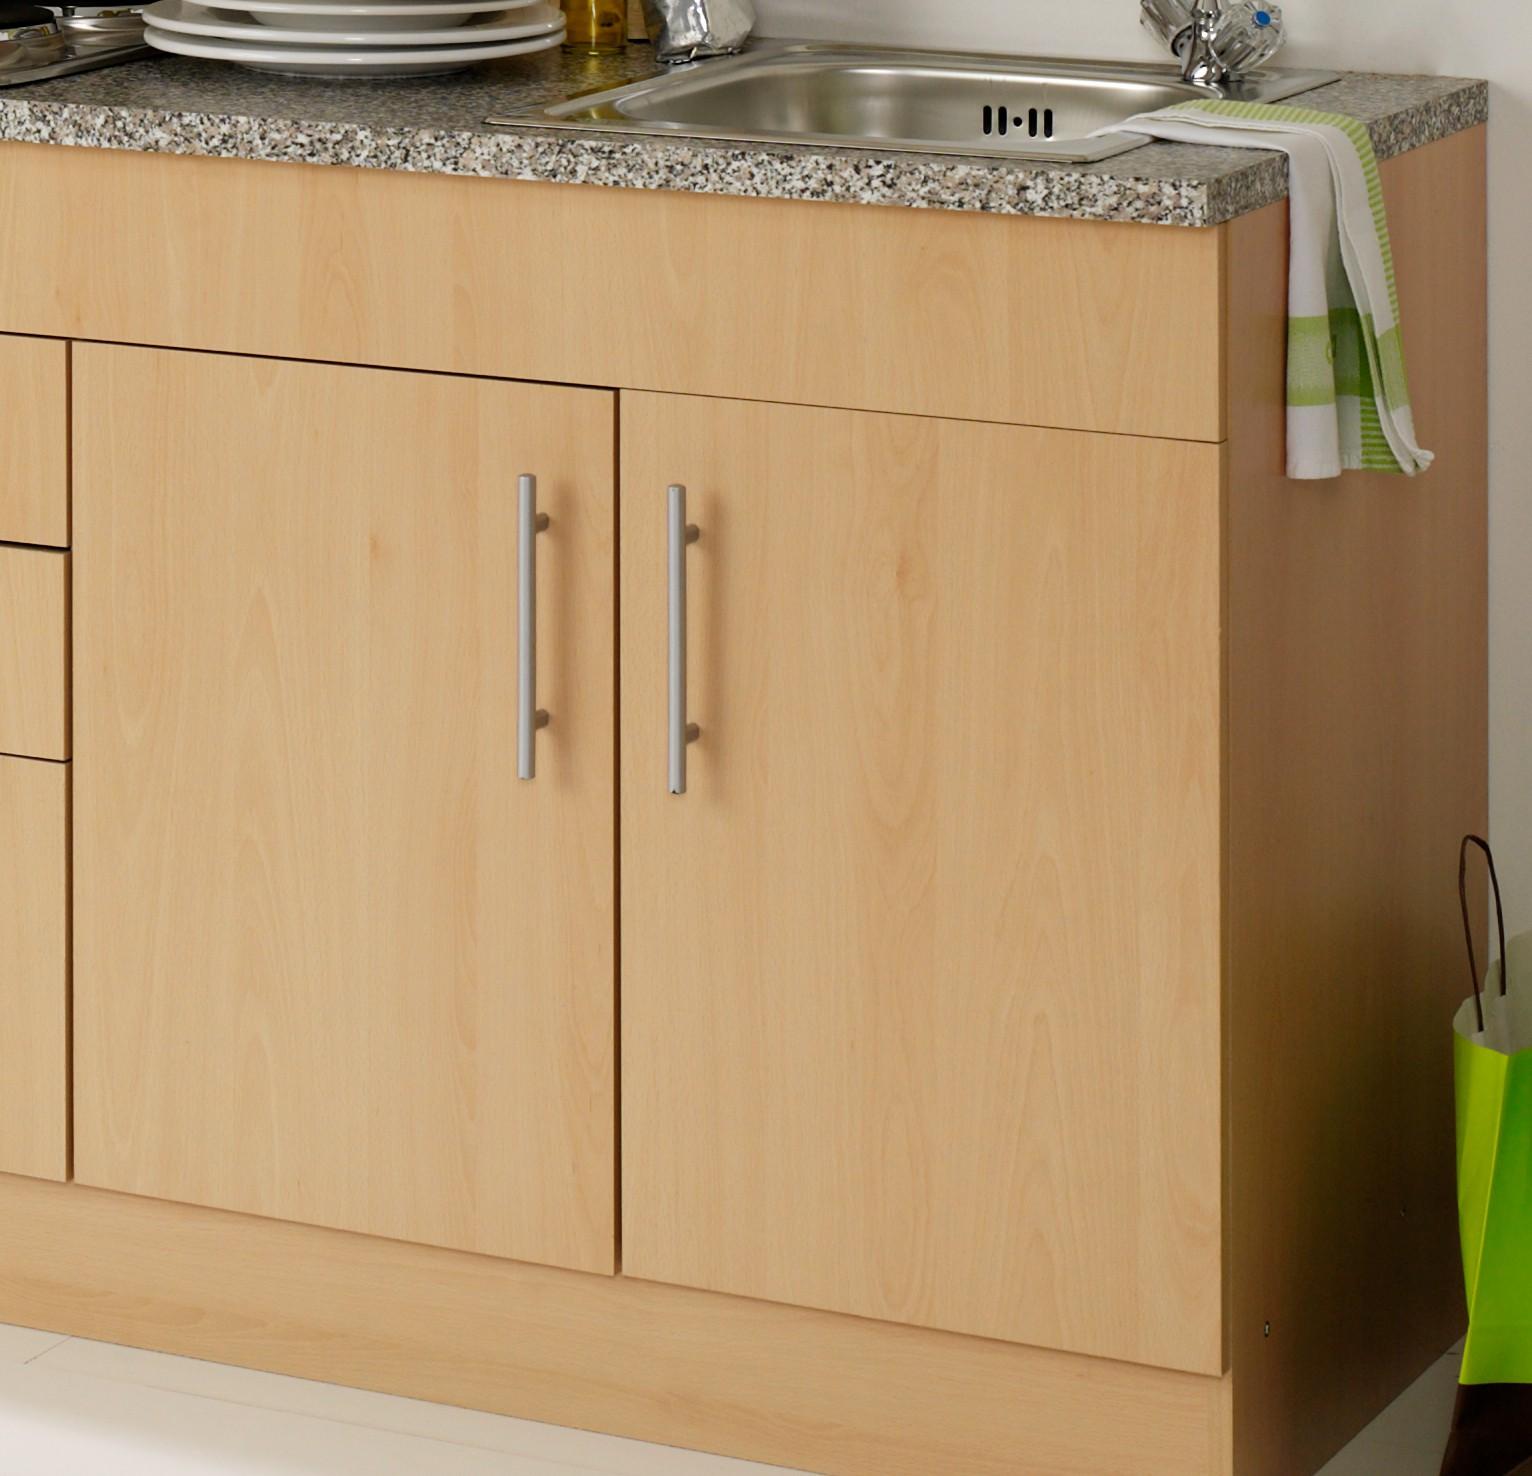 Singlekuche berlin breite 210 cm buche kuche singlekuchen for Singleküchen